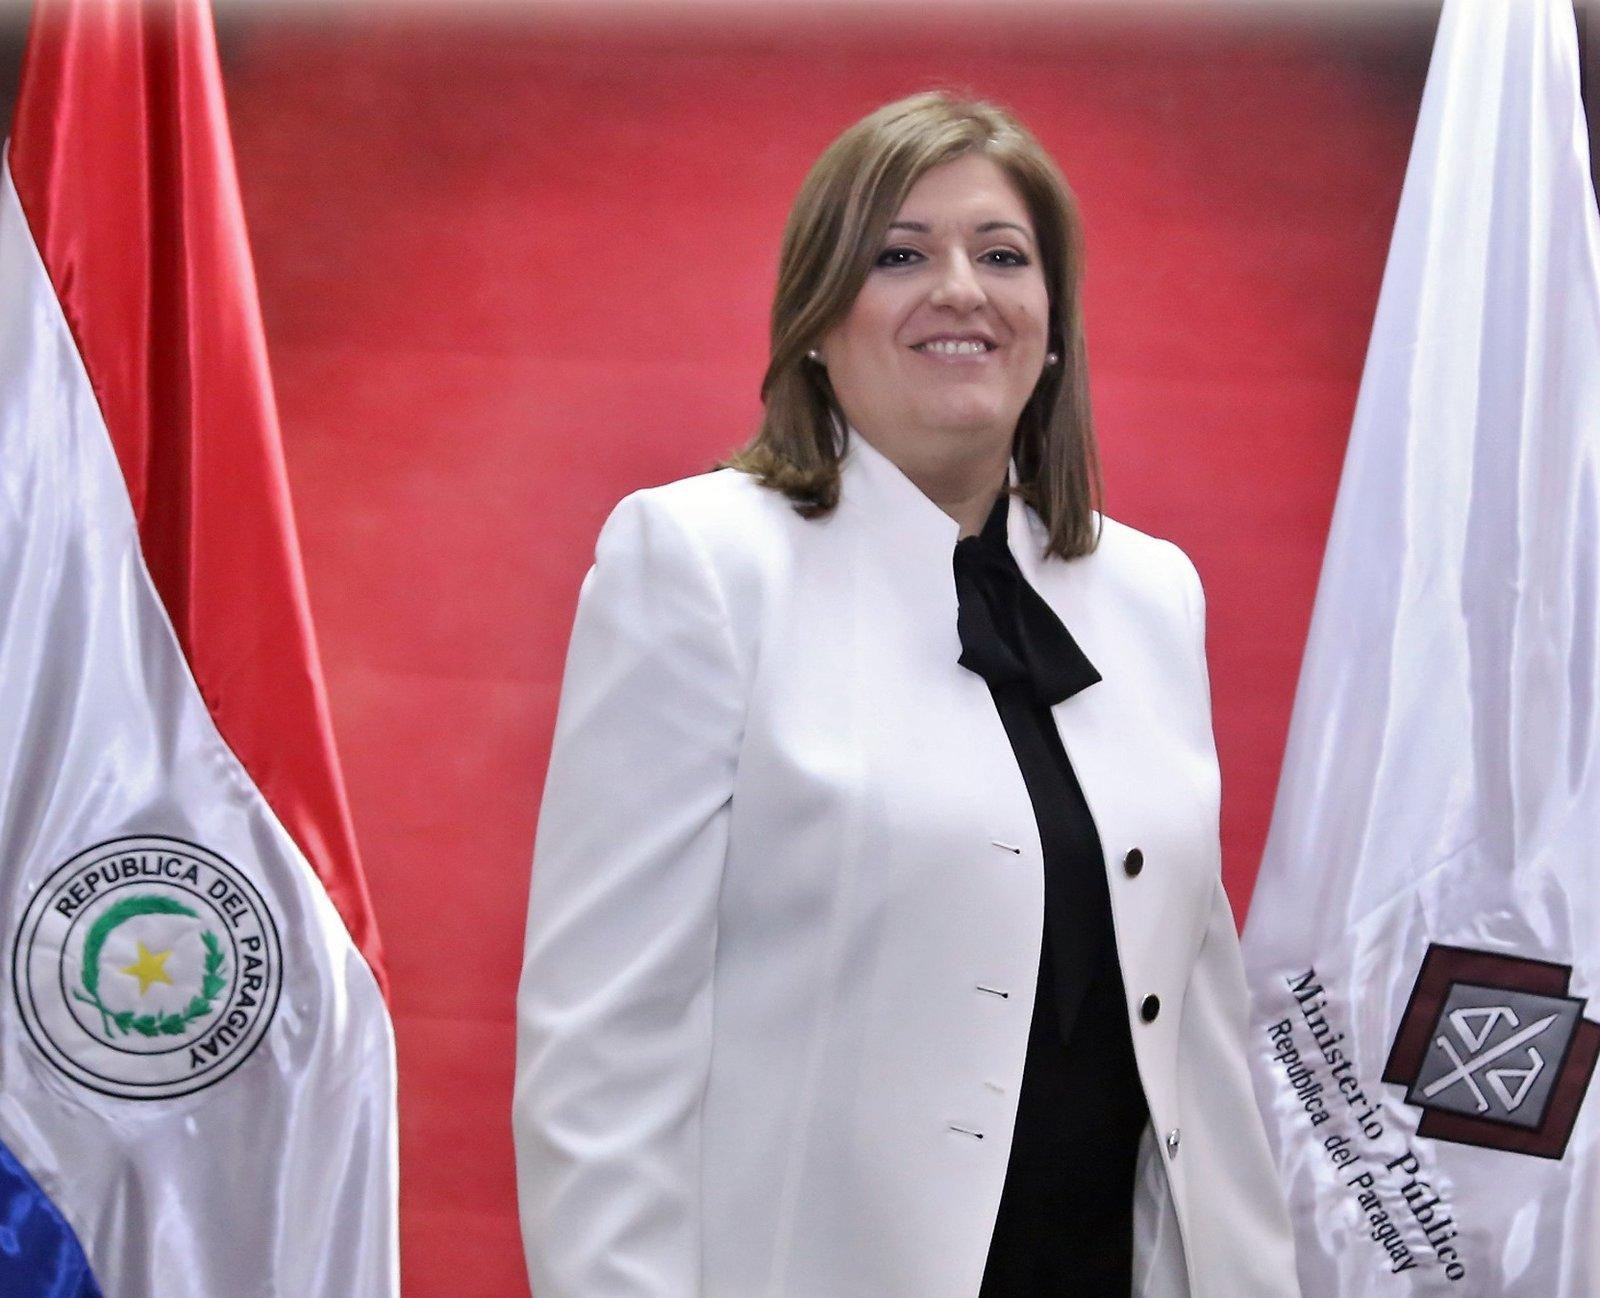 Esposa de líder opositor paraguayo encarcelado señala a la fiscal general